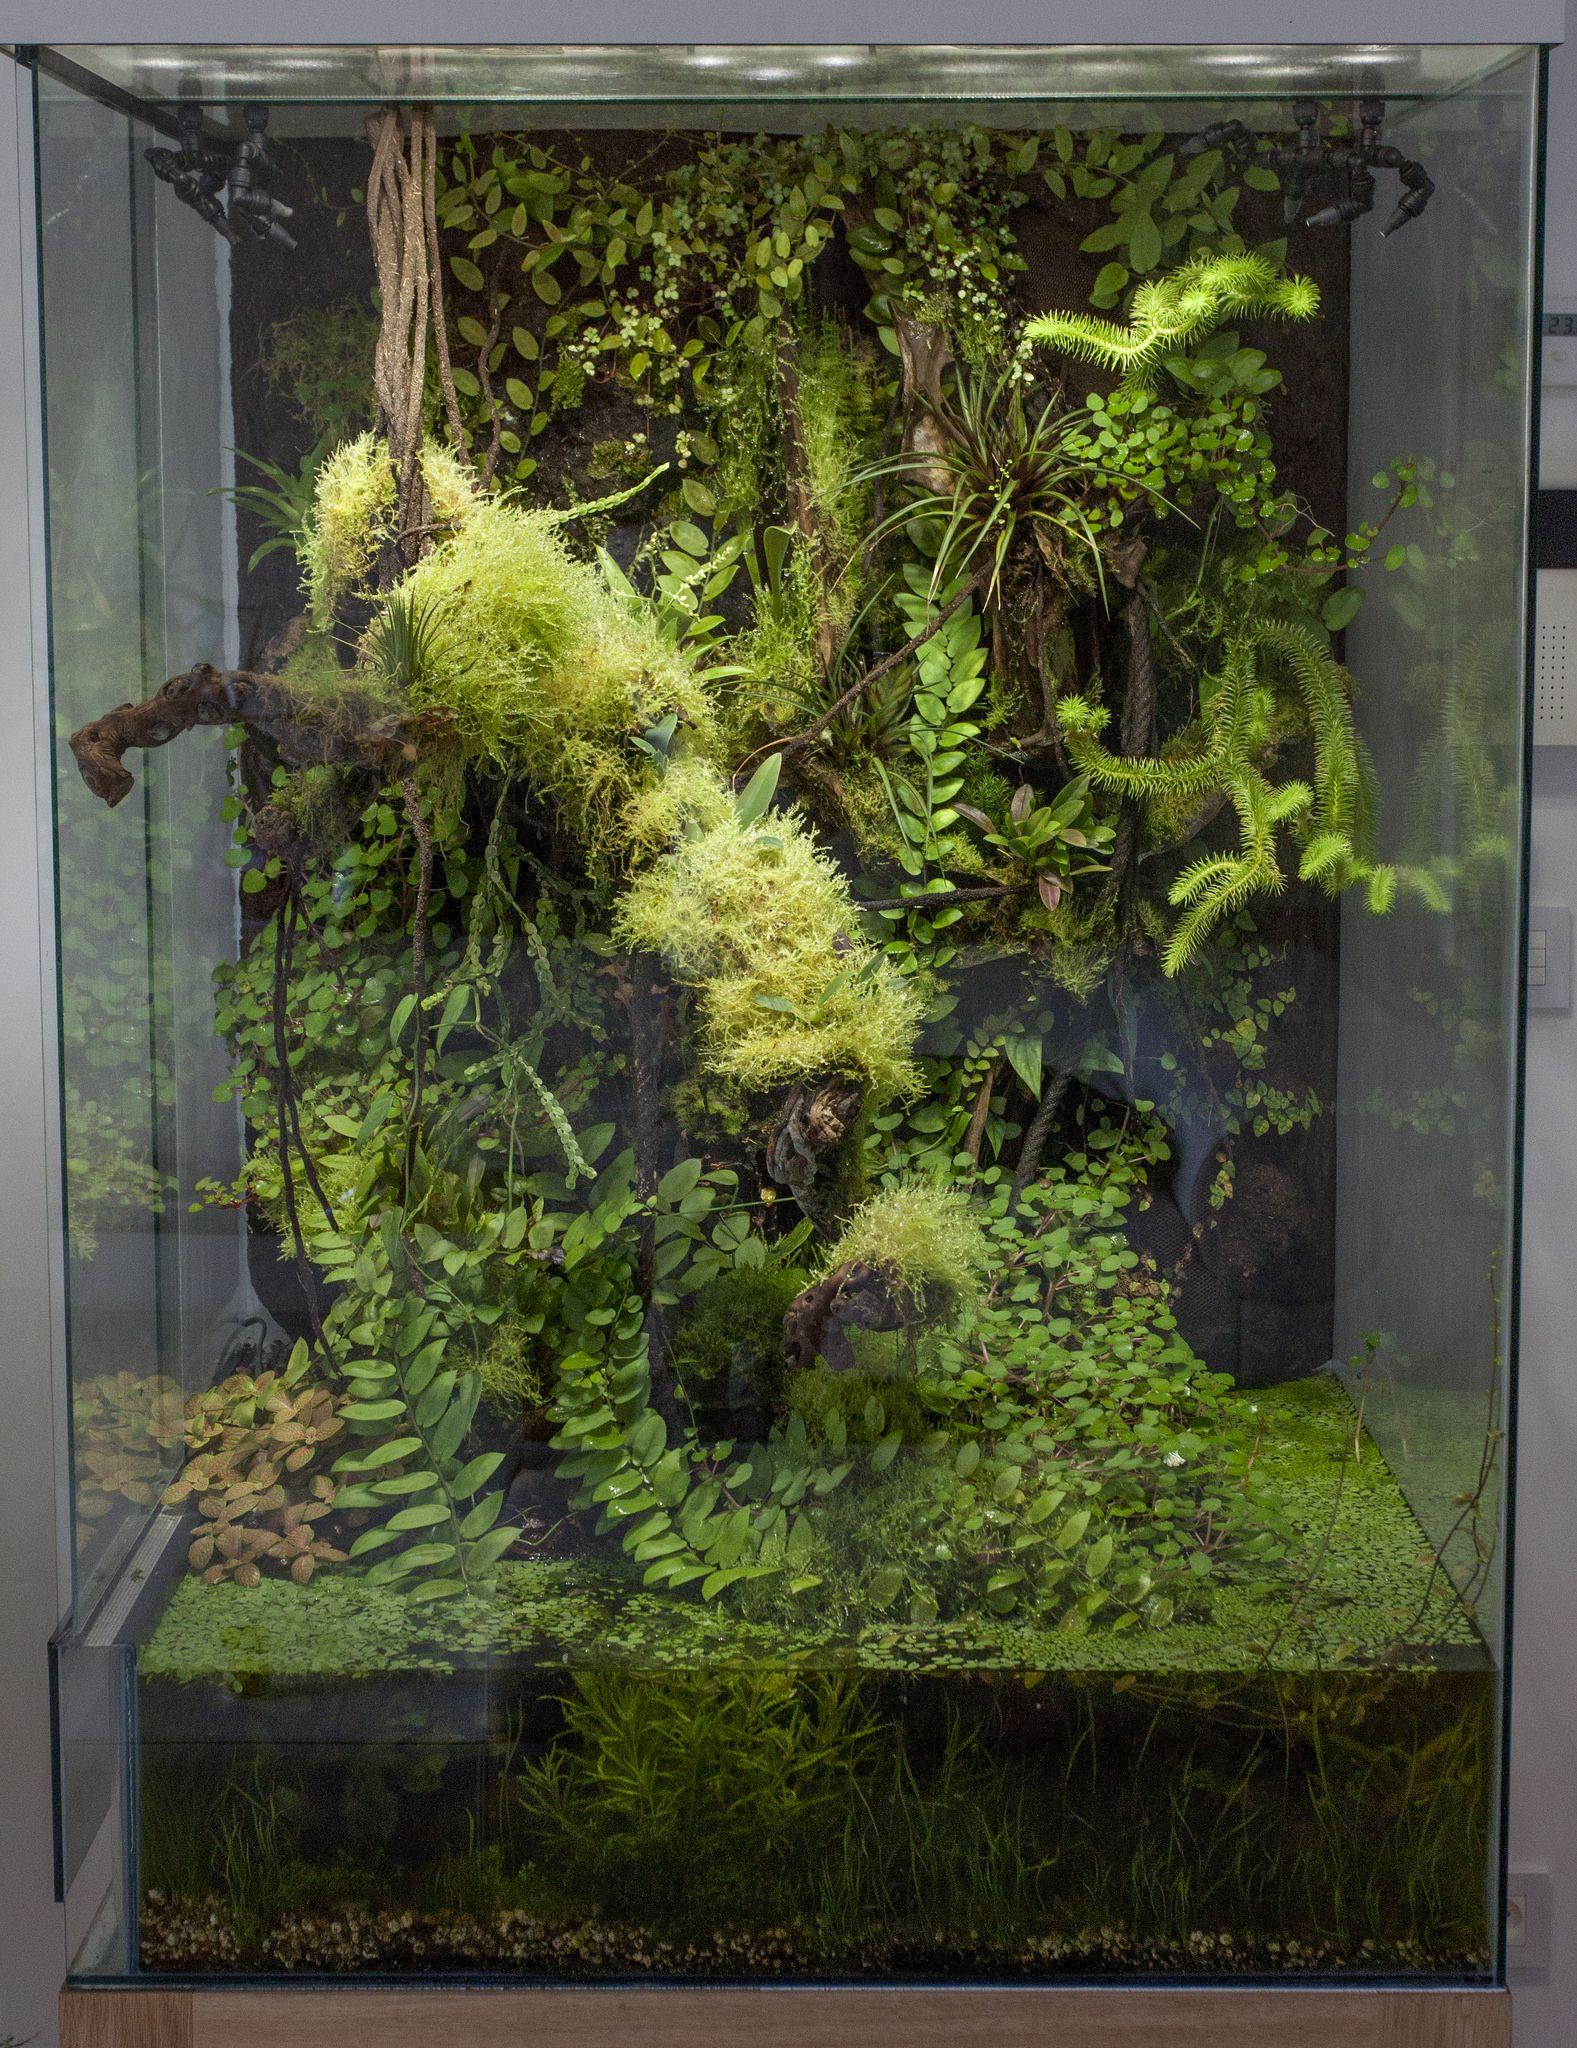 Mg terrariostanques pinterest vivarium terraria and